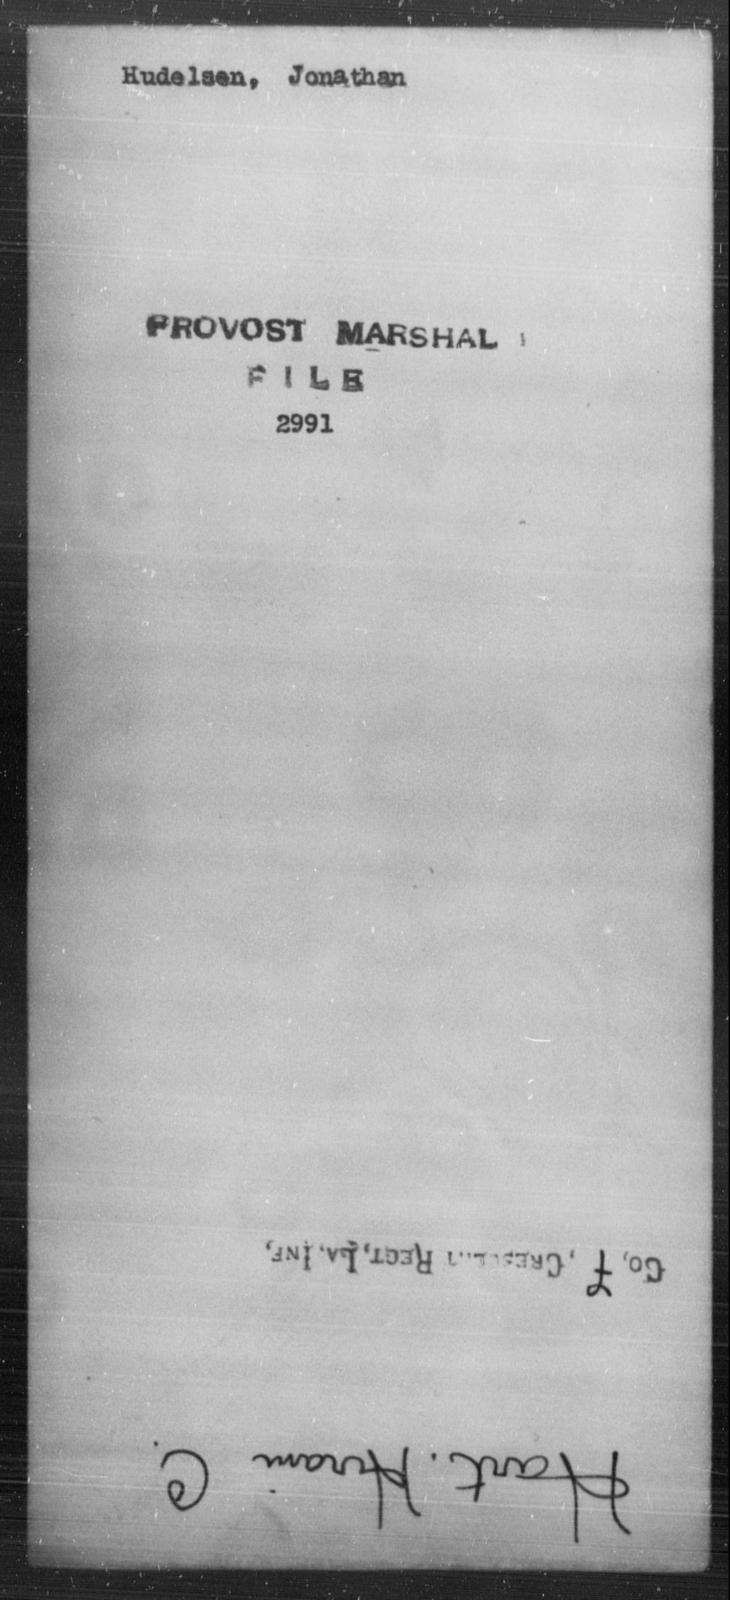 Hudelsen, Jonathan - State: [Blank] - Year: [Blank]